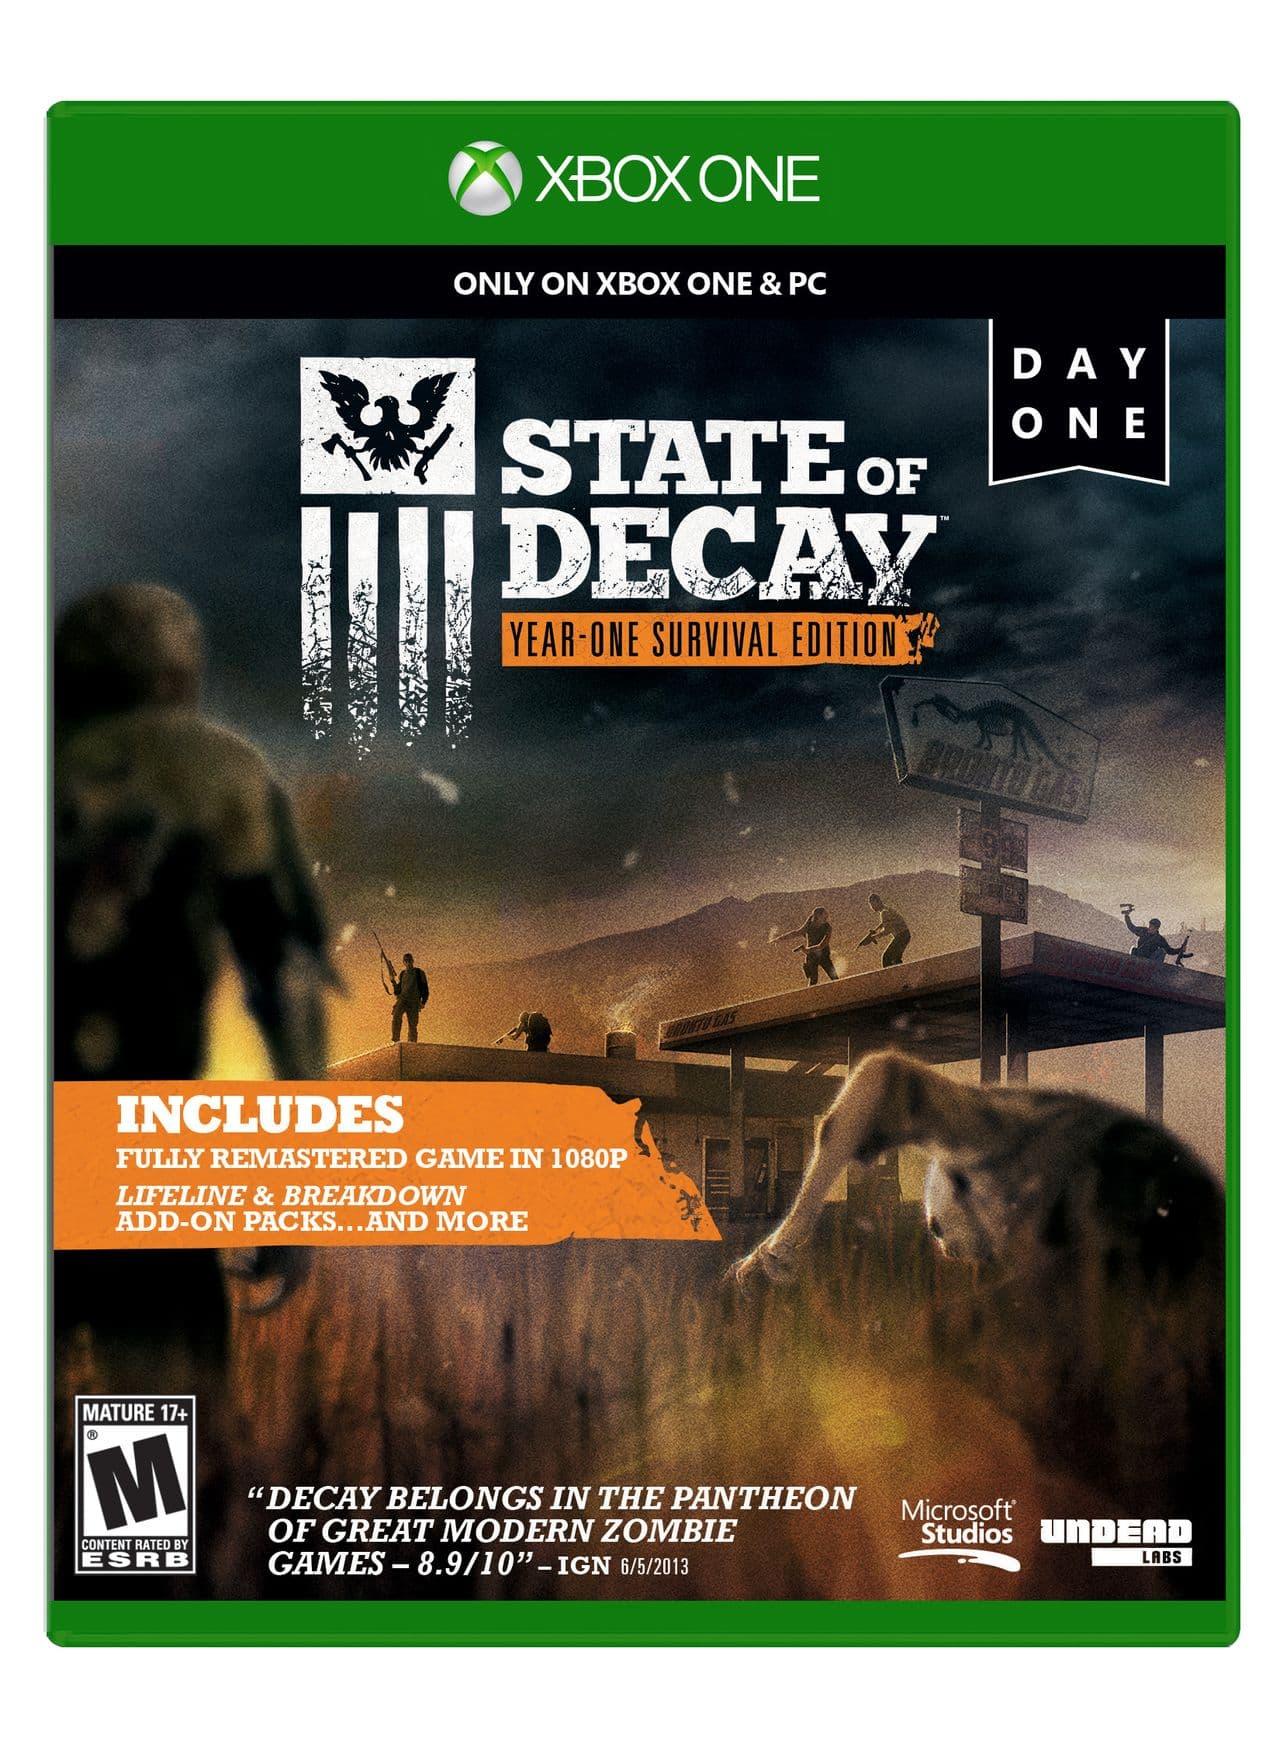 State of Decay: Year One Survival Edition: Quelques images , une jaquette et des informations